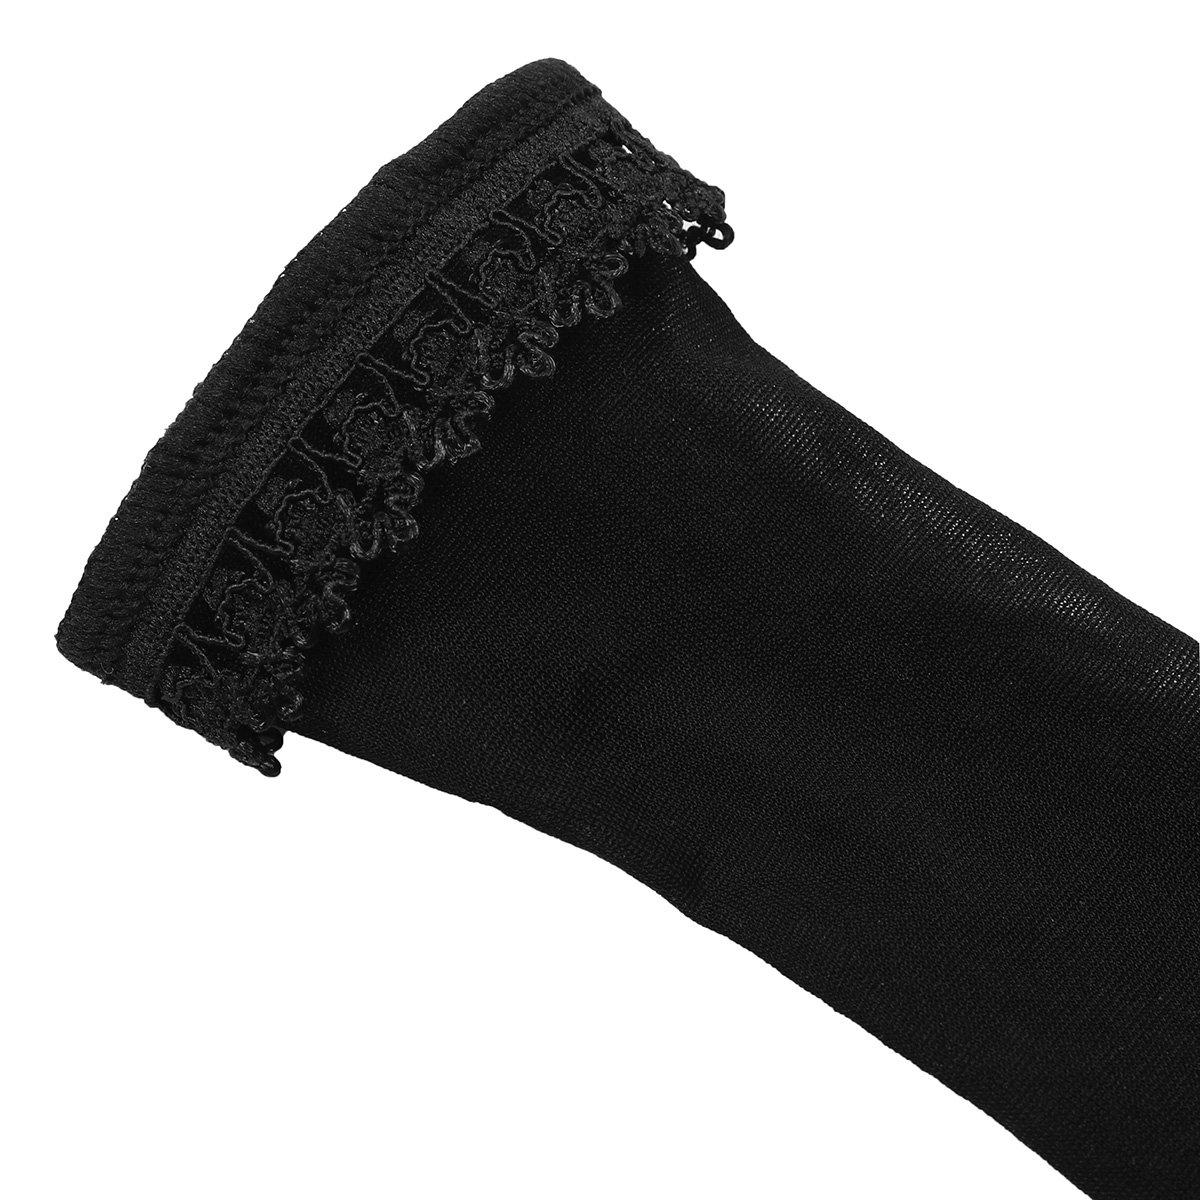 zdhoor Mens Sheer See-Through Micro Thong T-Back Bikini Briefs Open Sheath Naughty Underwear